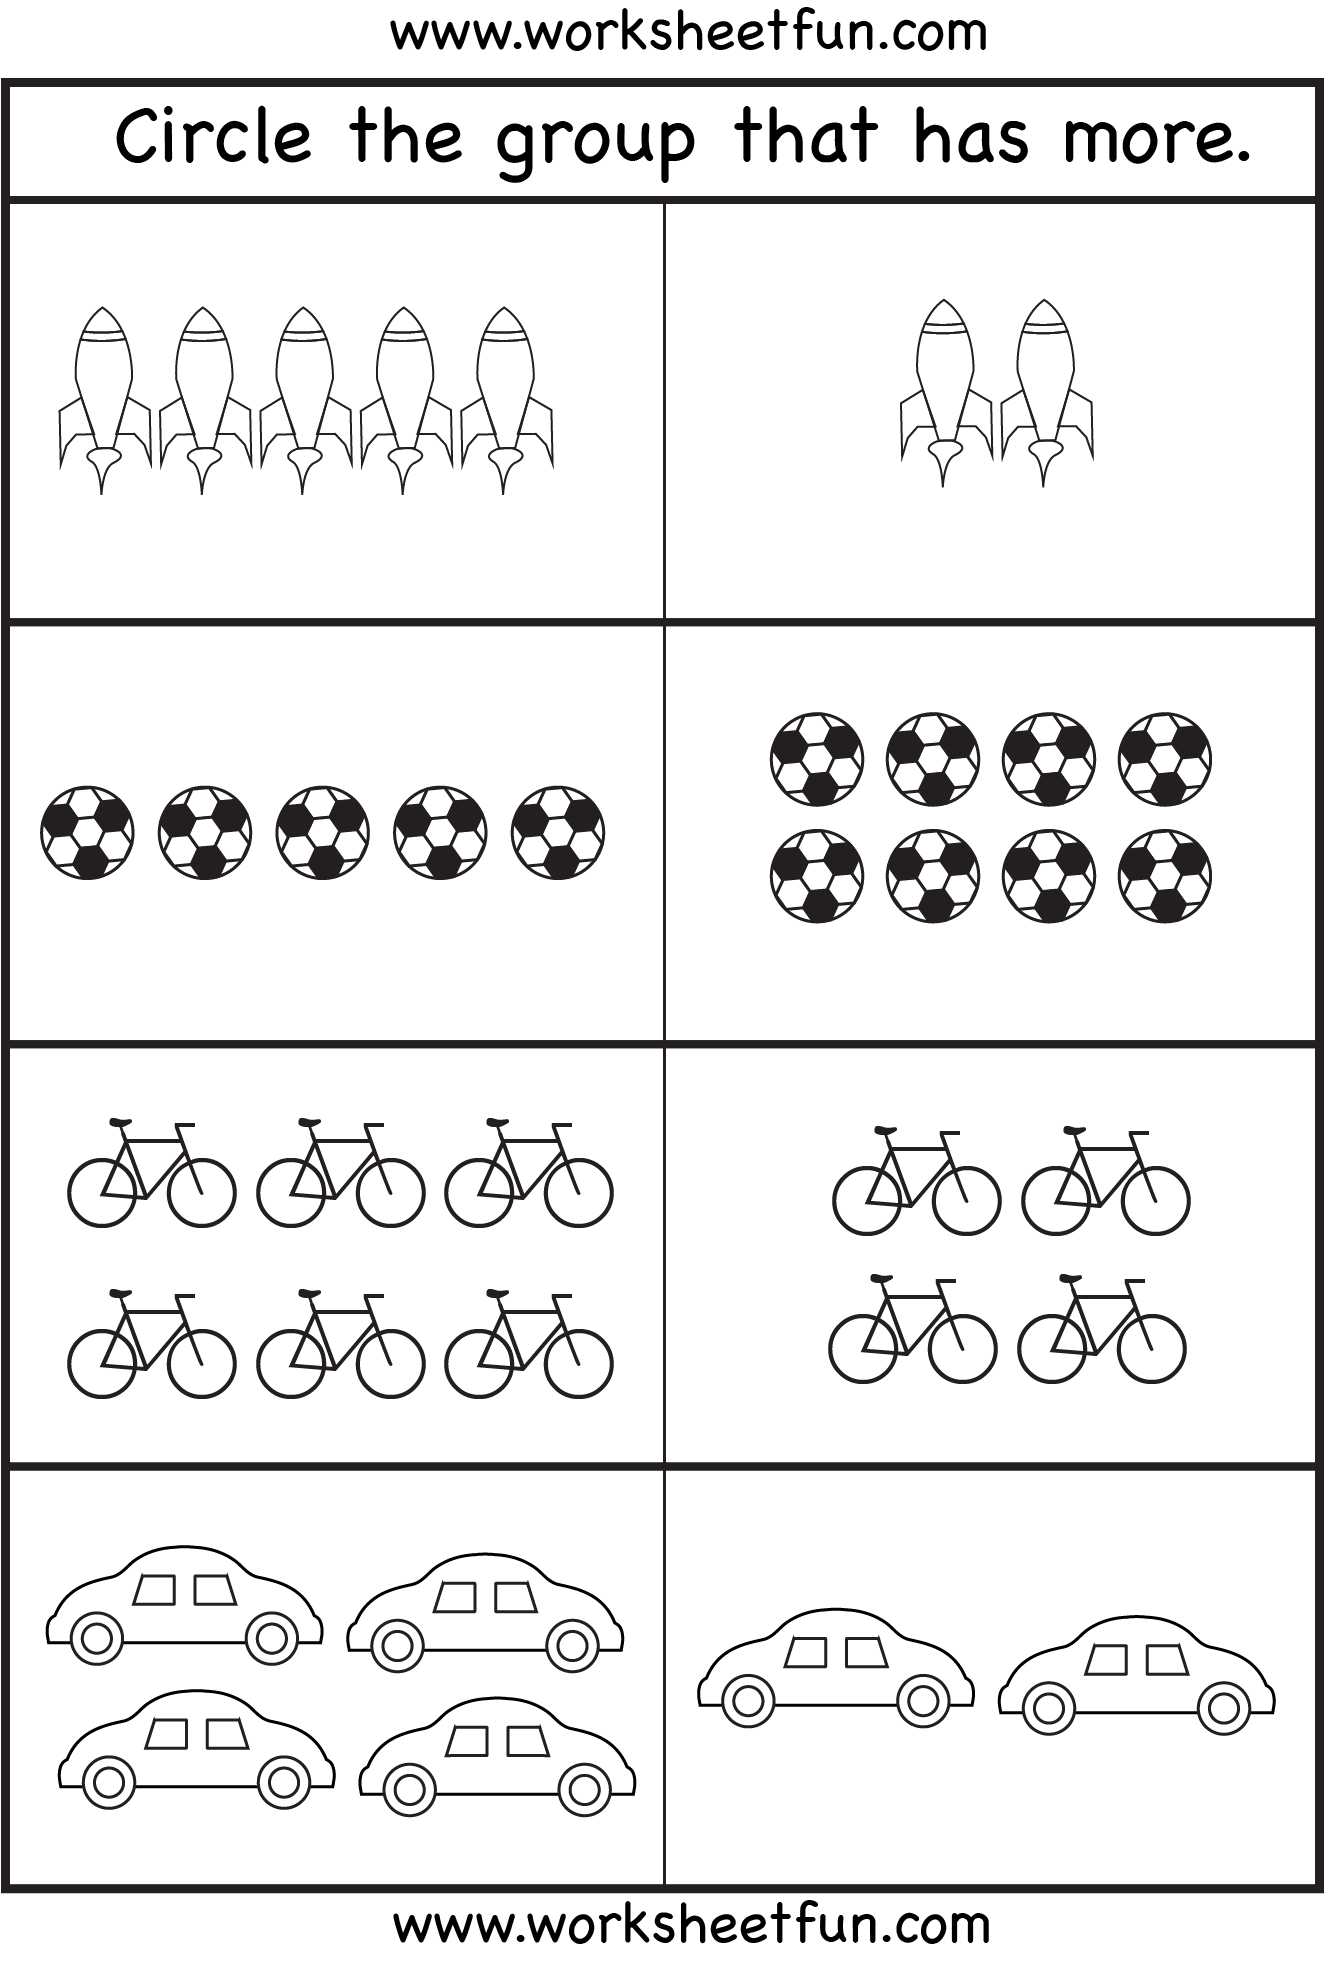 Comparison Worksheets – More or Less – 4 Worksheets   Printable preschool  worksheets [ 1973 x 1324 Pixel ]